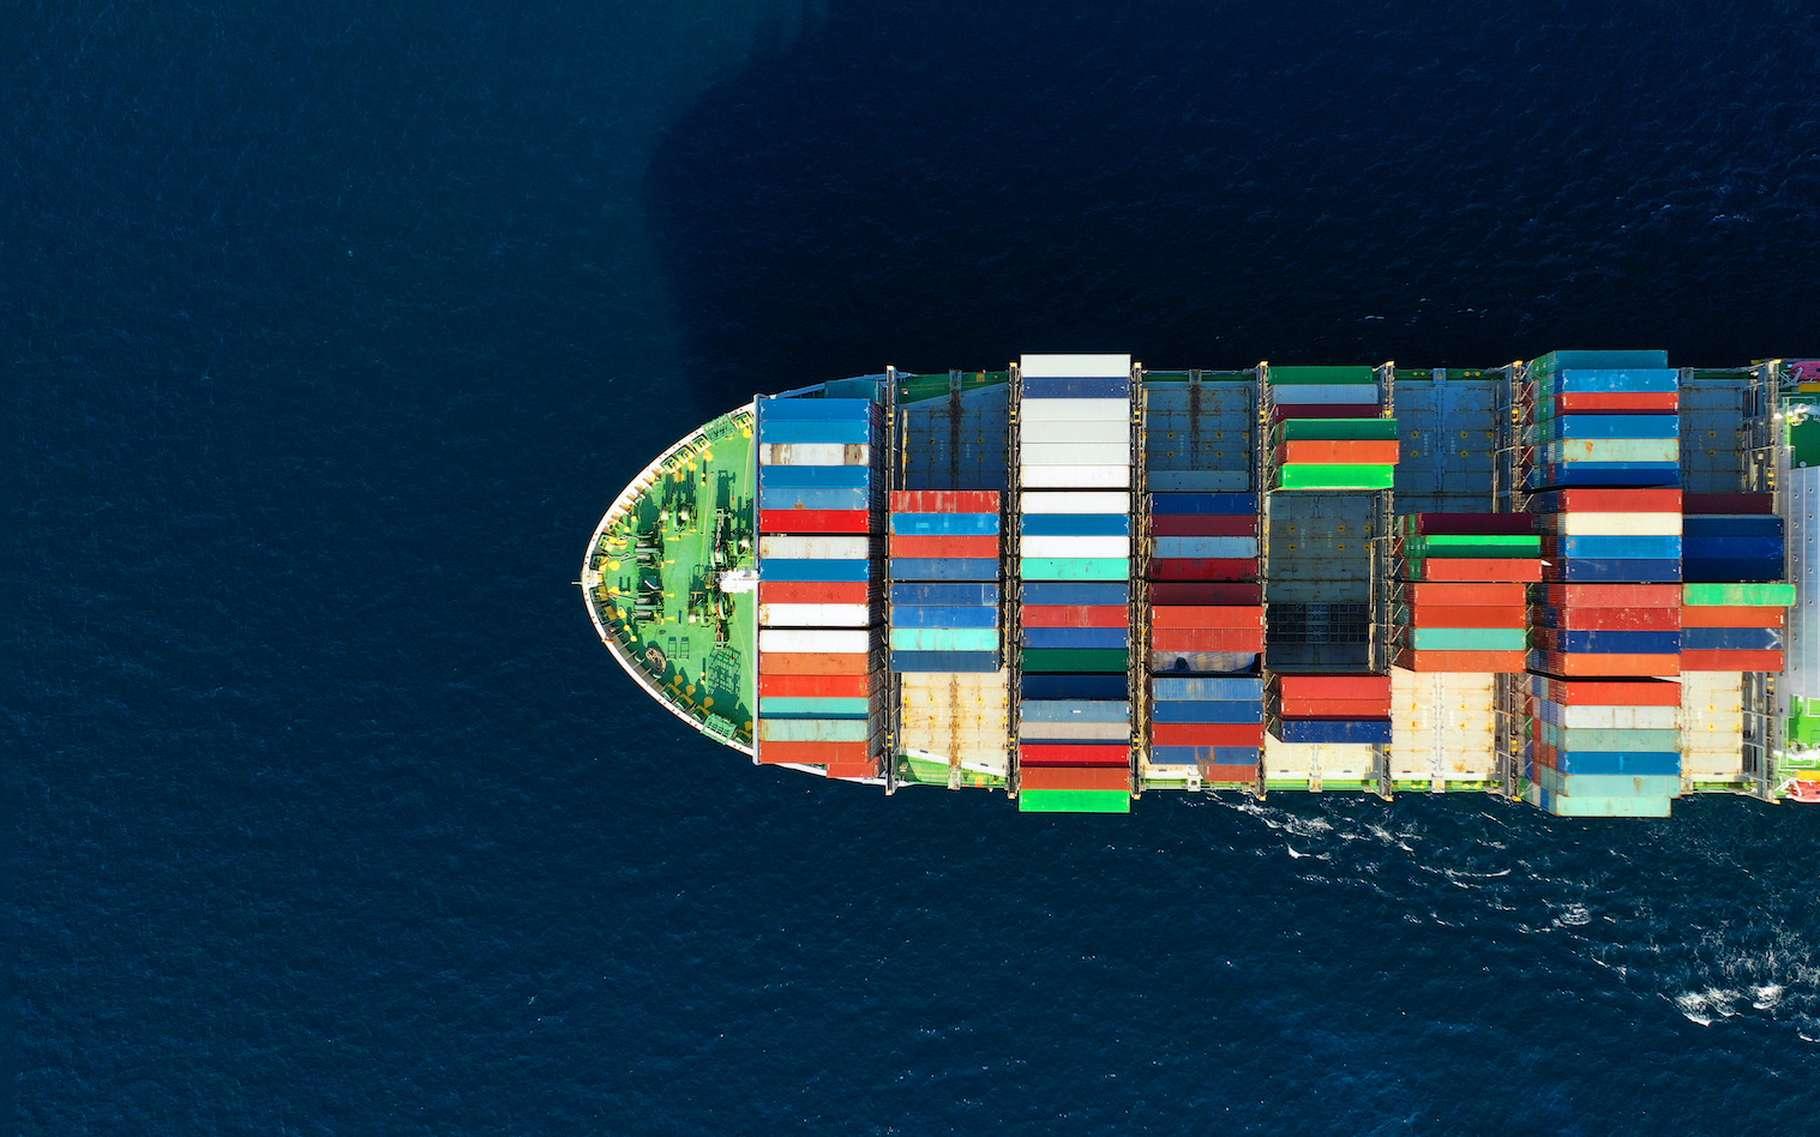 L'hydrogène révolutionnera-t-il le transport maritime ? © aerial-drone, Adobe Stock